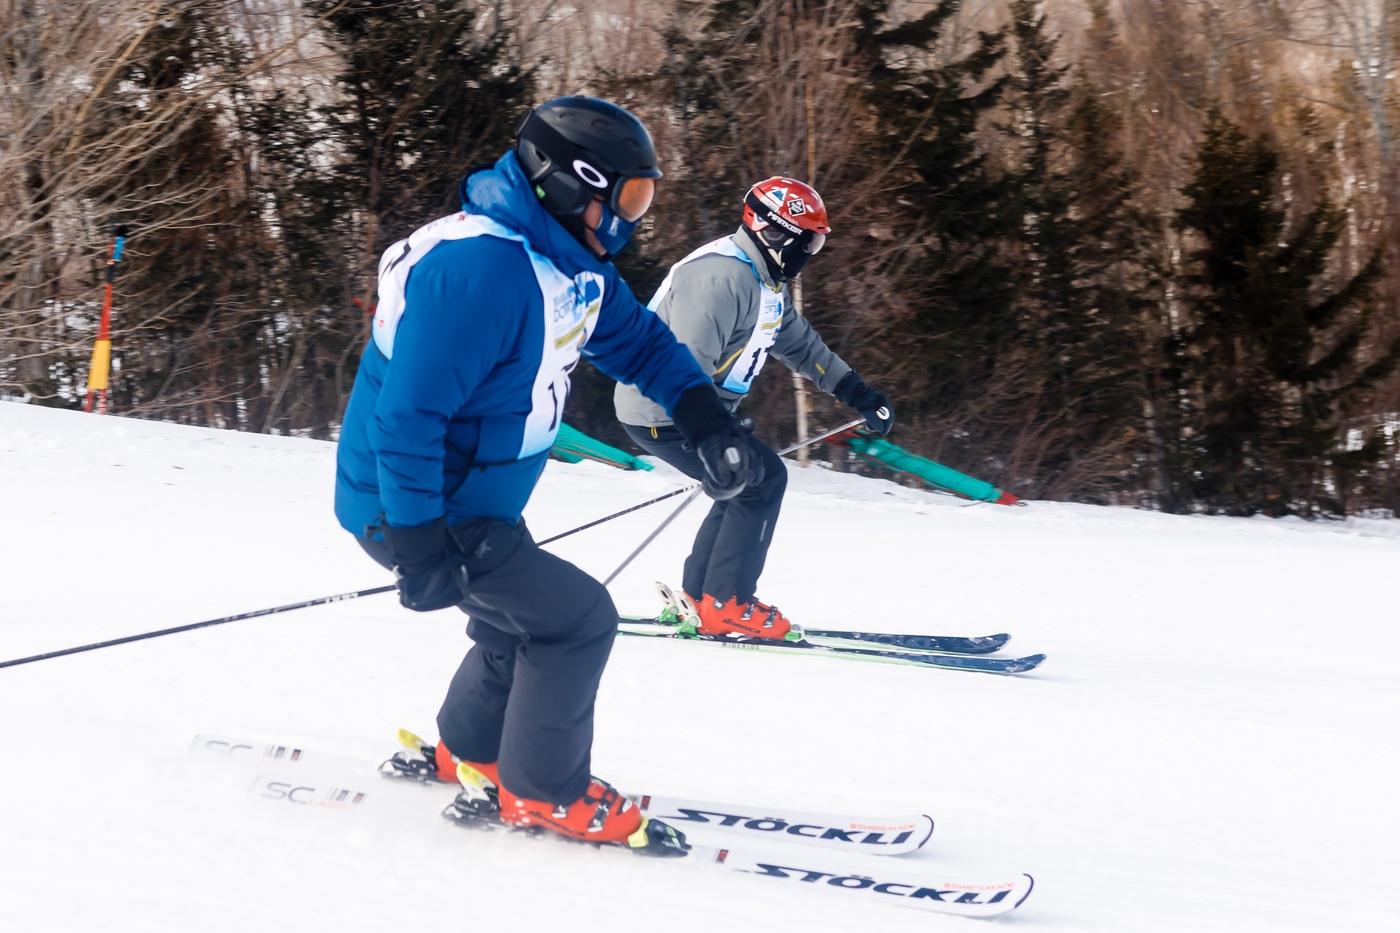 WinterKids Downhill 24 2021 SDP 3392